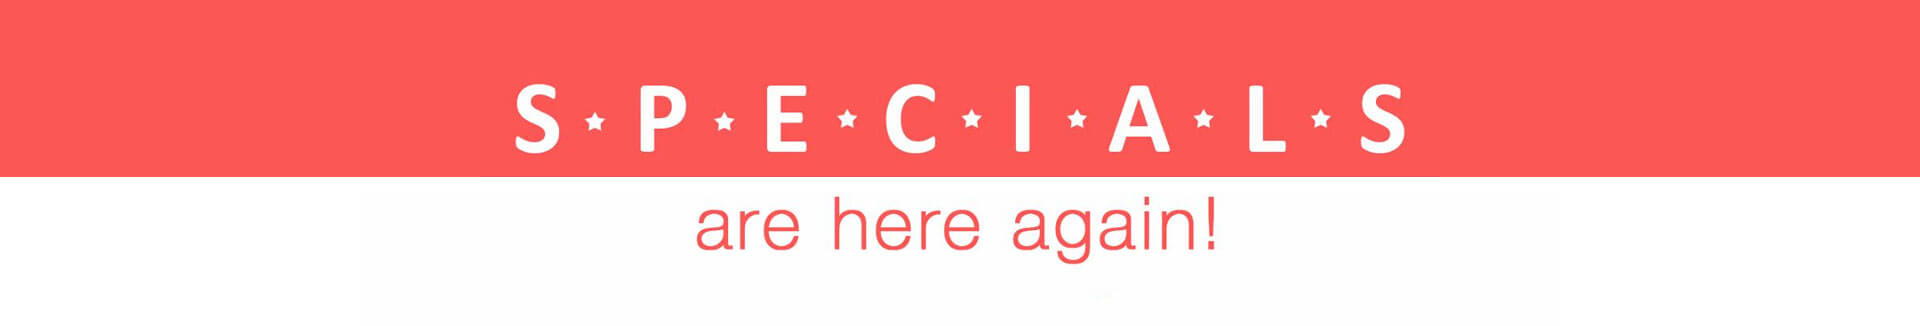 Denver Skin Care Clinic and Medical Spa Specials summer specials header banner 1920